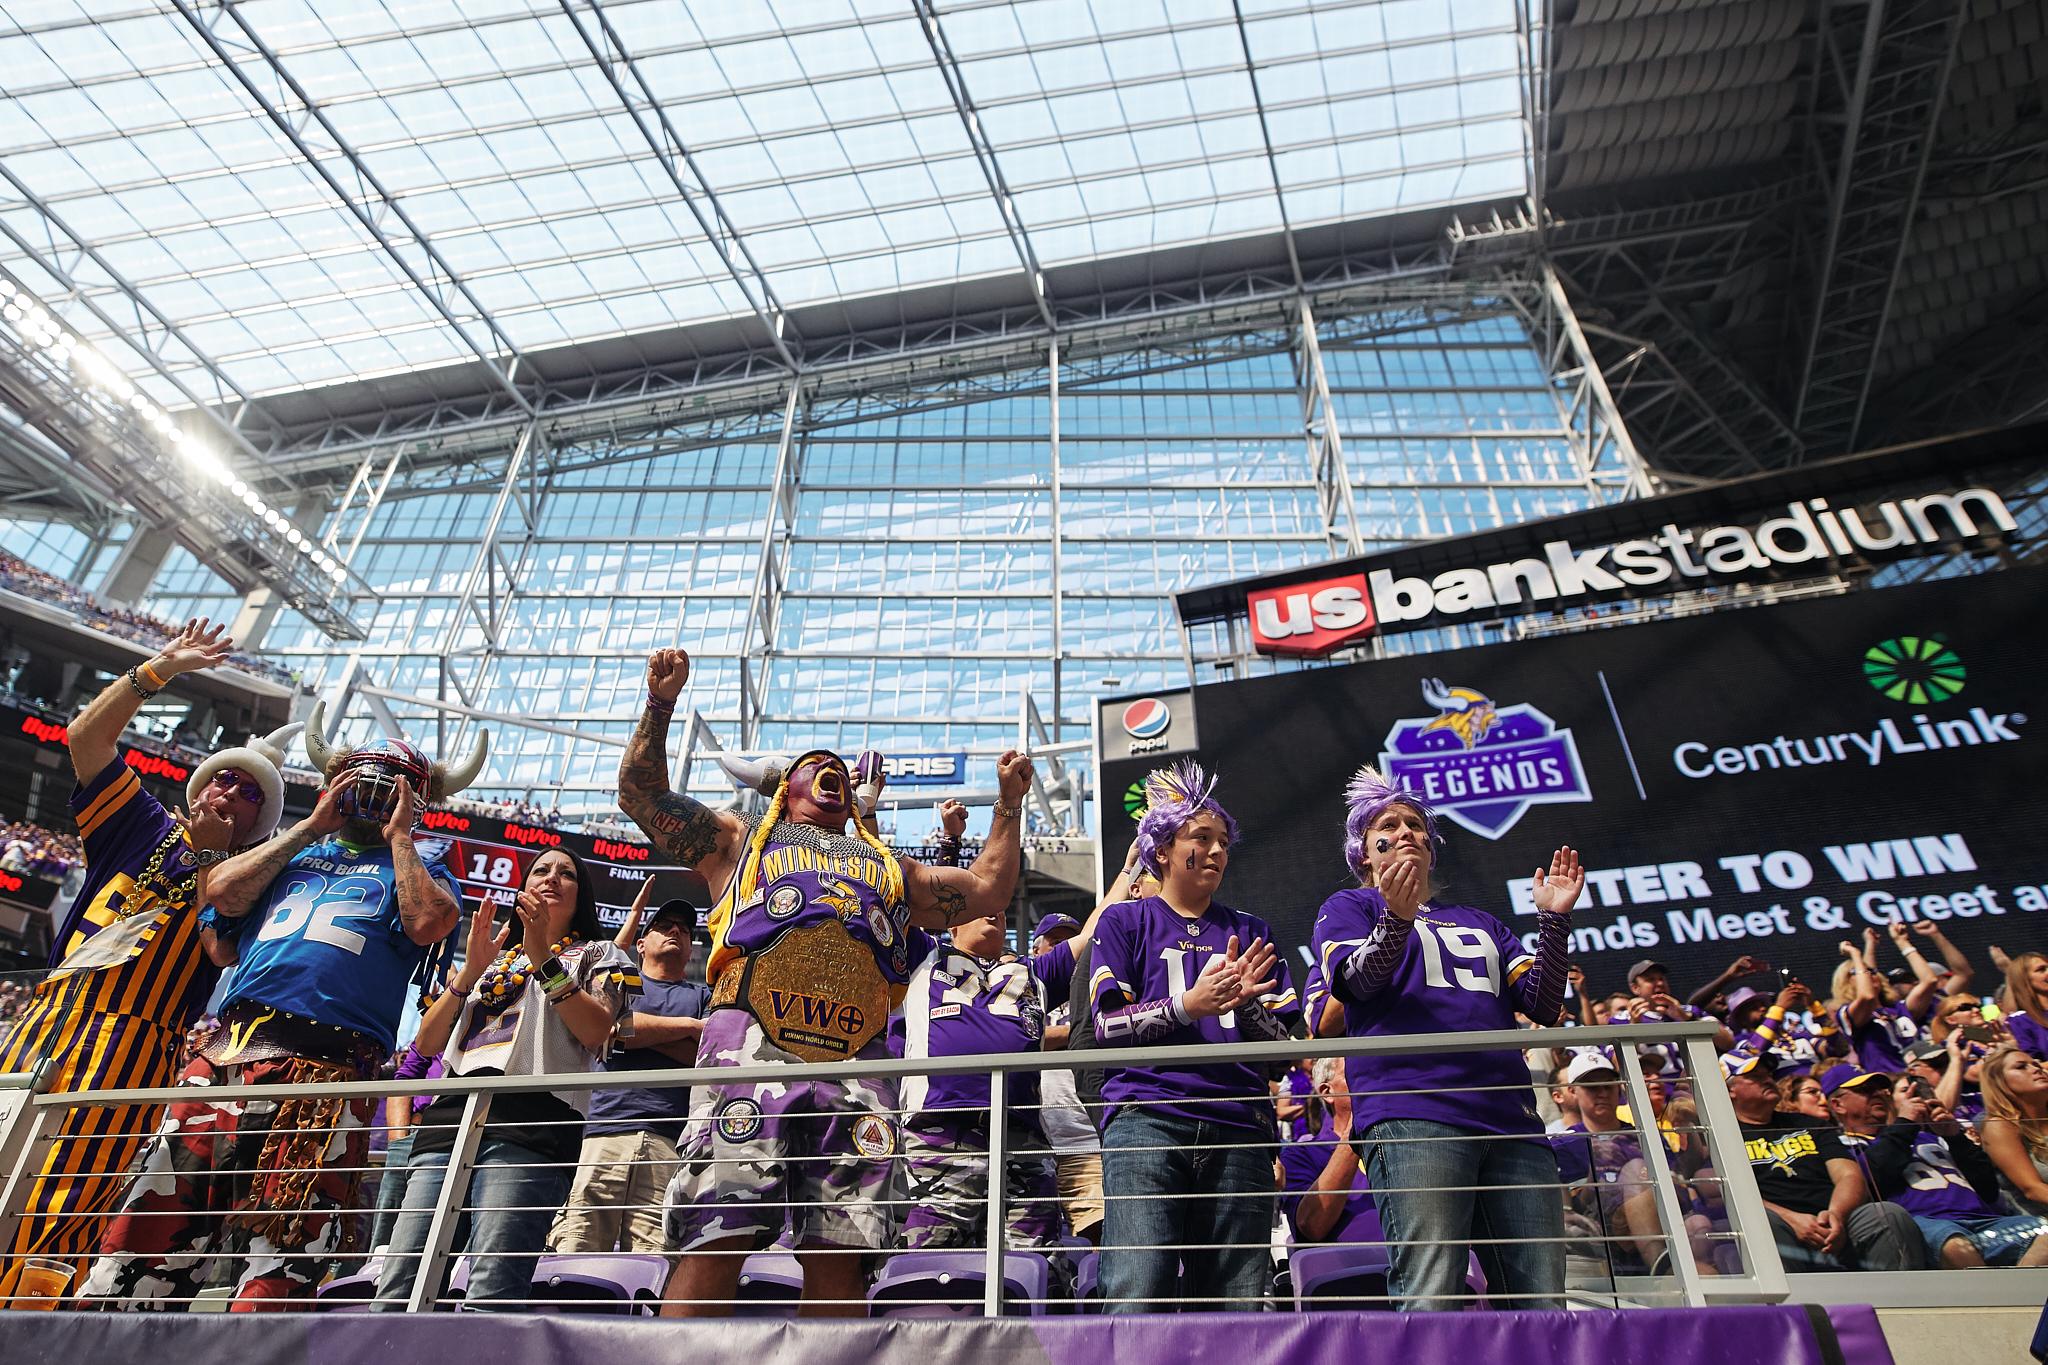 Minnesota_Vikings_Game_US_Bank_Stadium_Minneapolis_Minnesota_Photography_By_Joe_Lemke_053.JPG